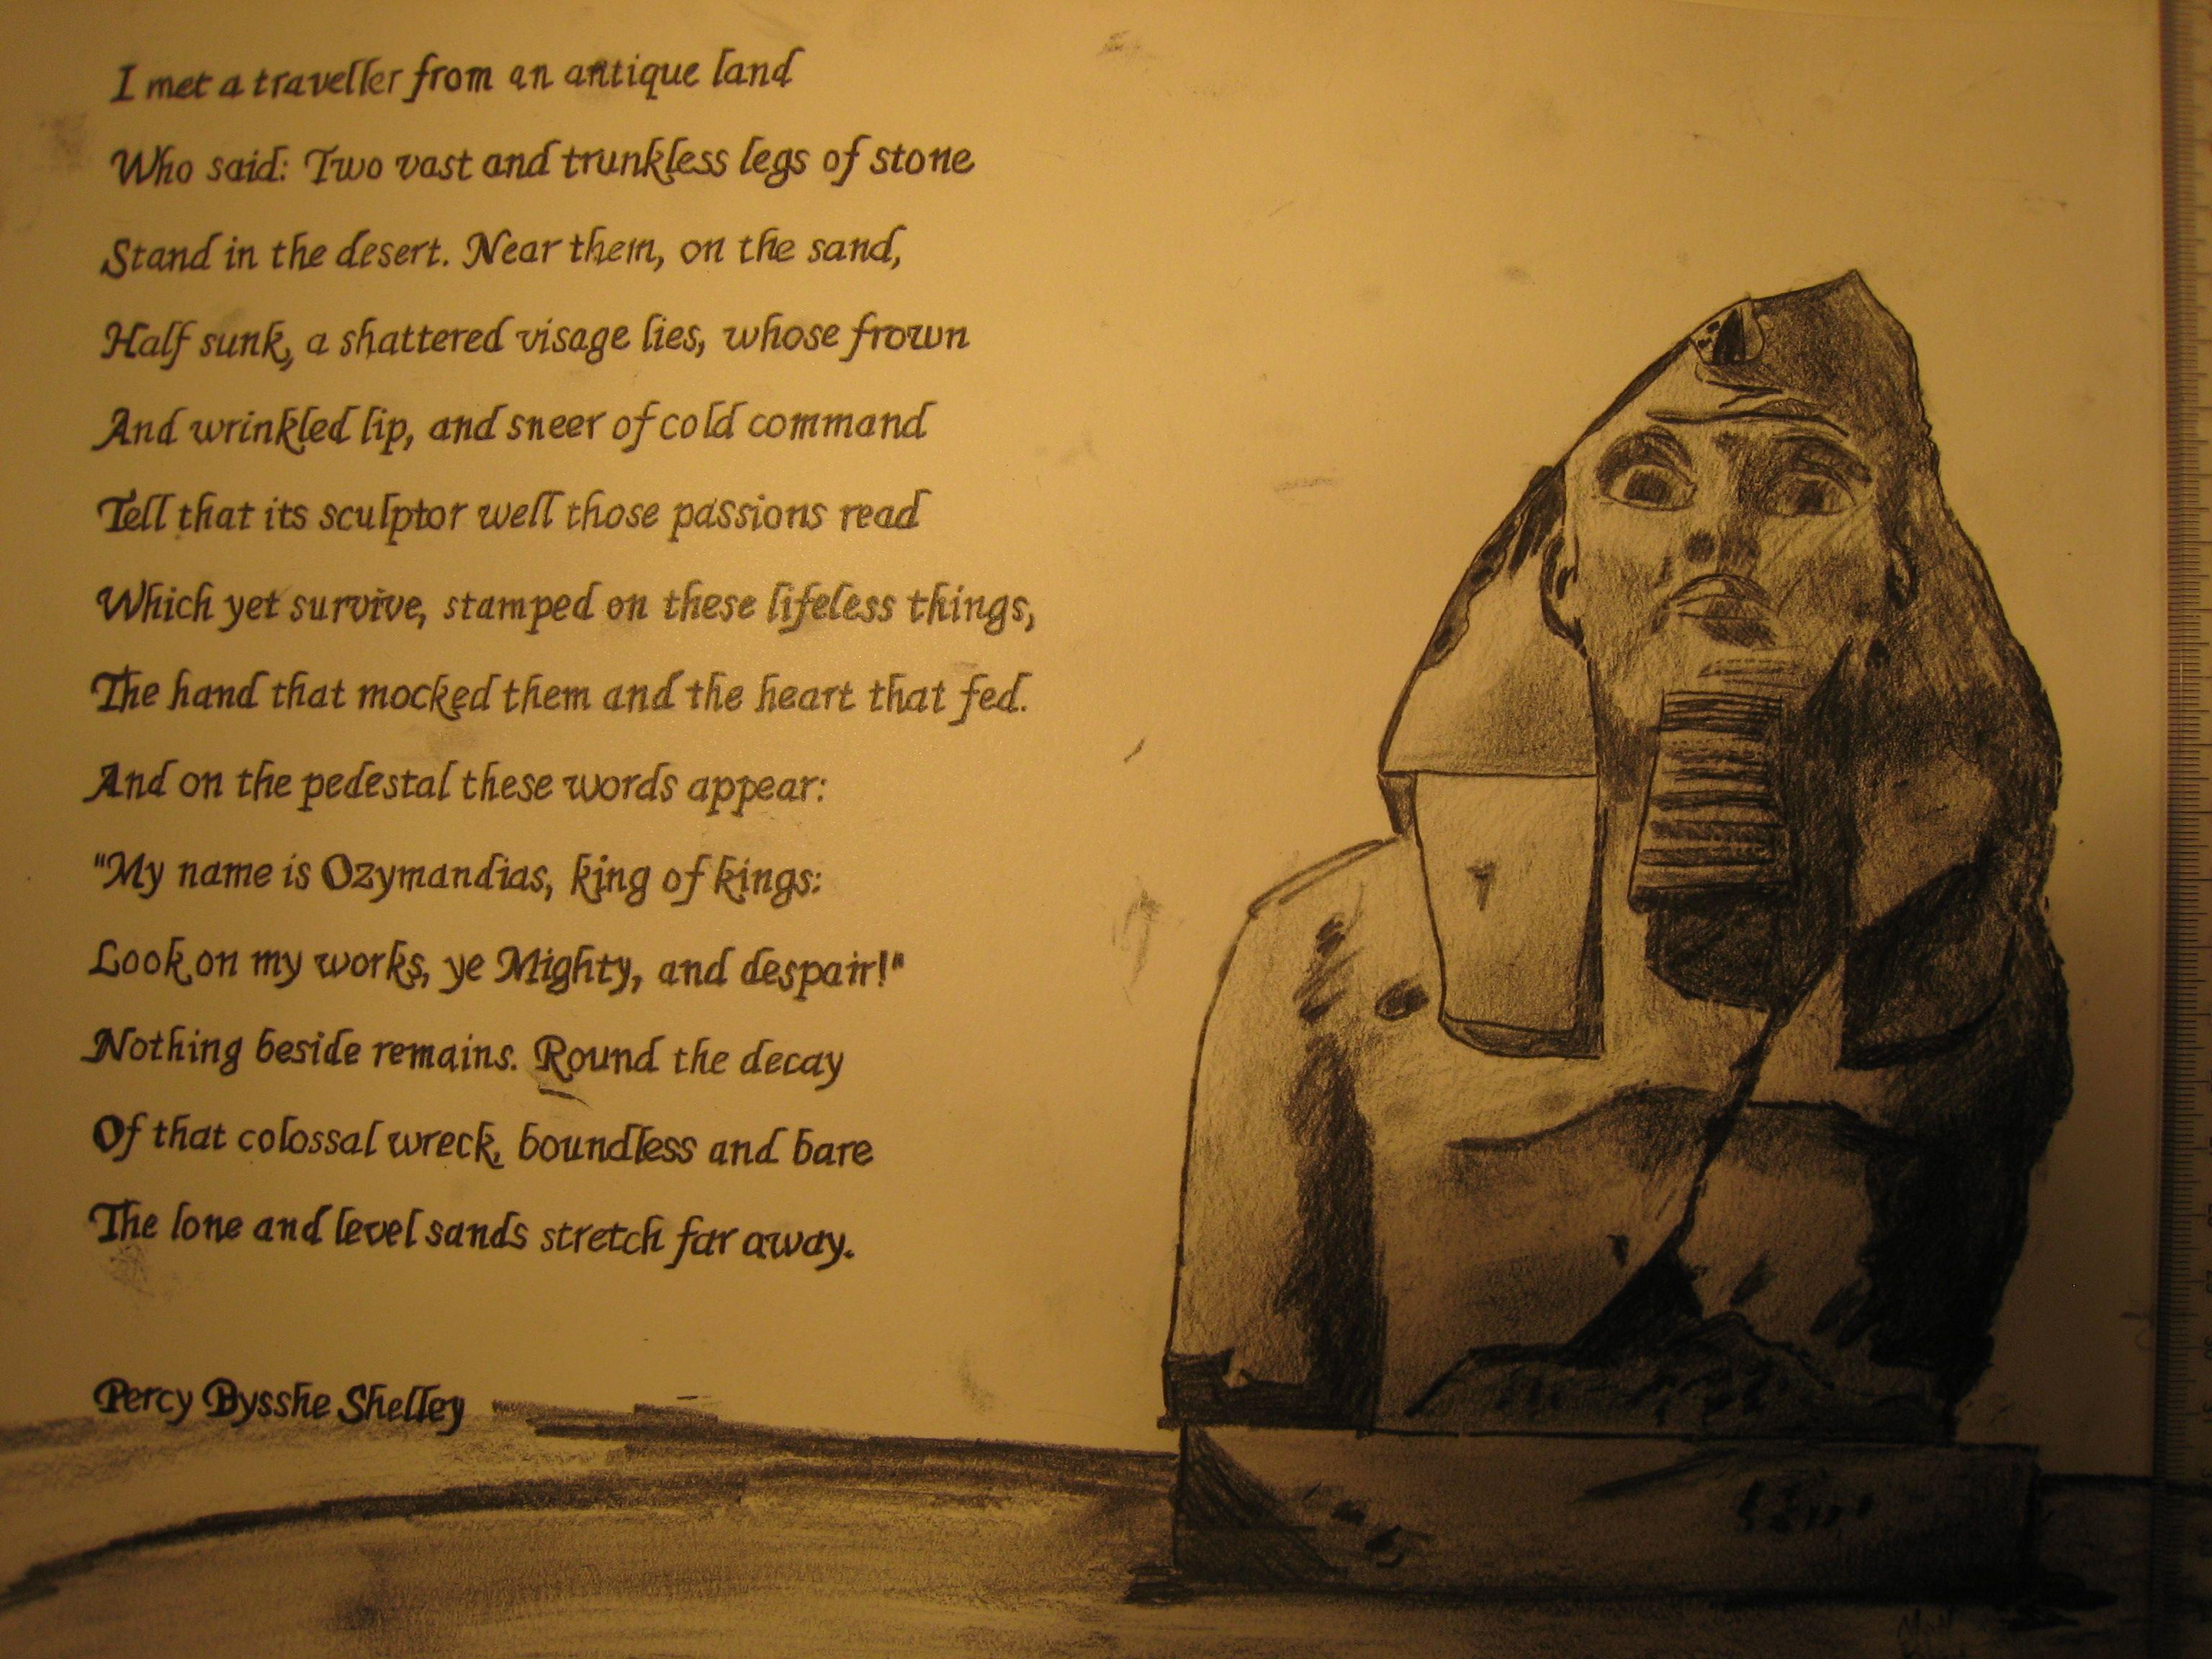 Ozymandias Poem By Percy Bysshe Shelley Smart People Talking